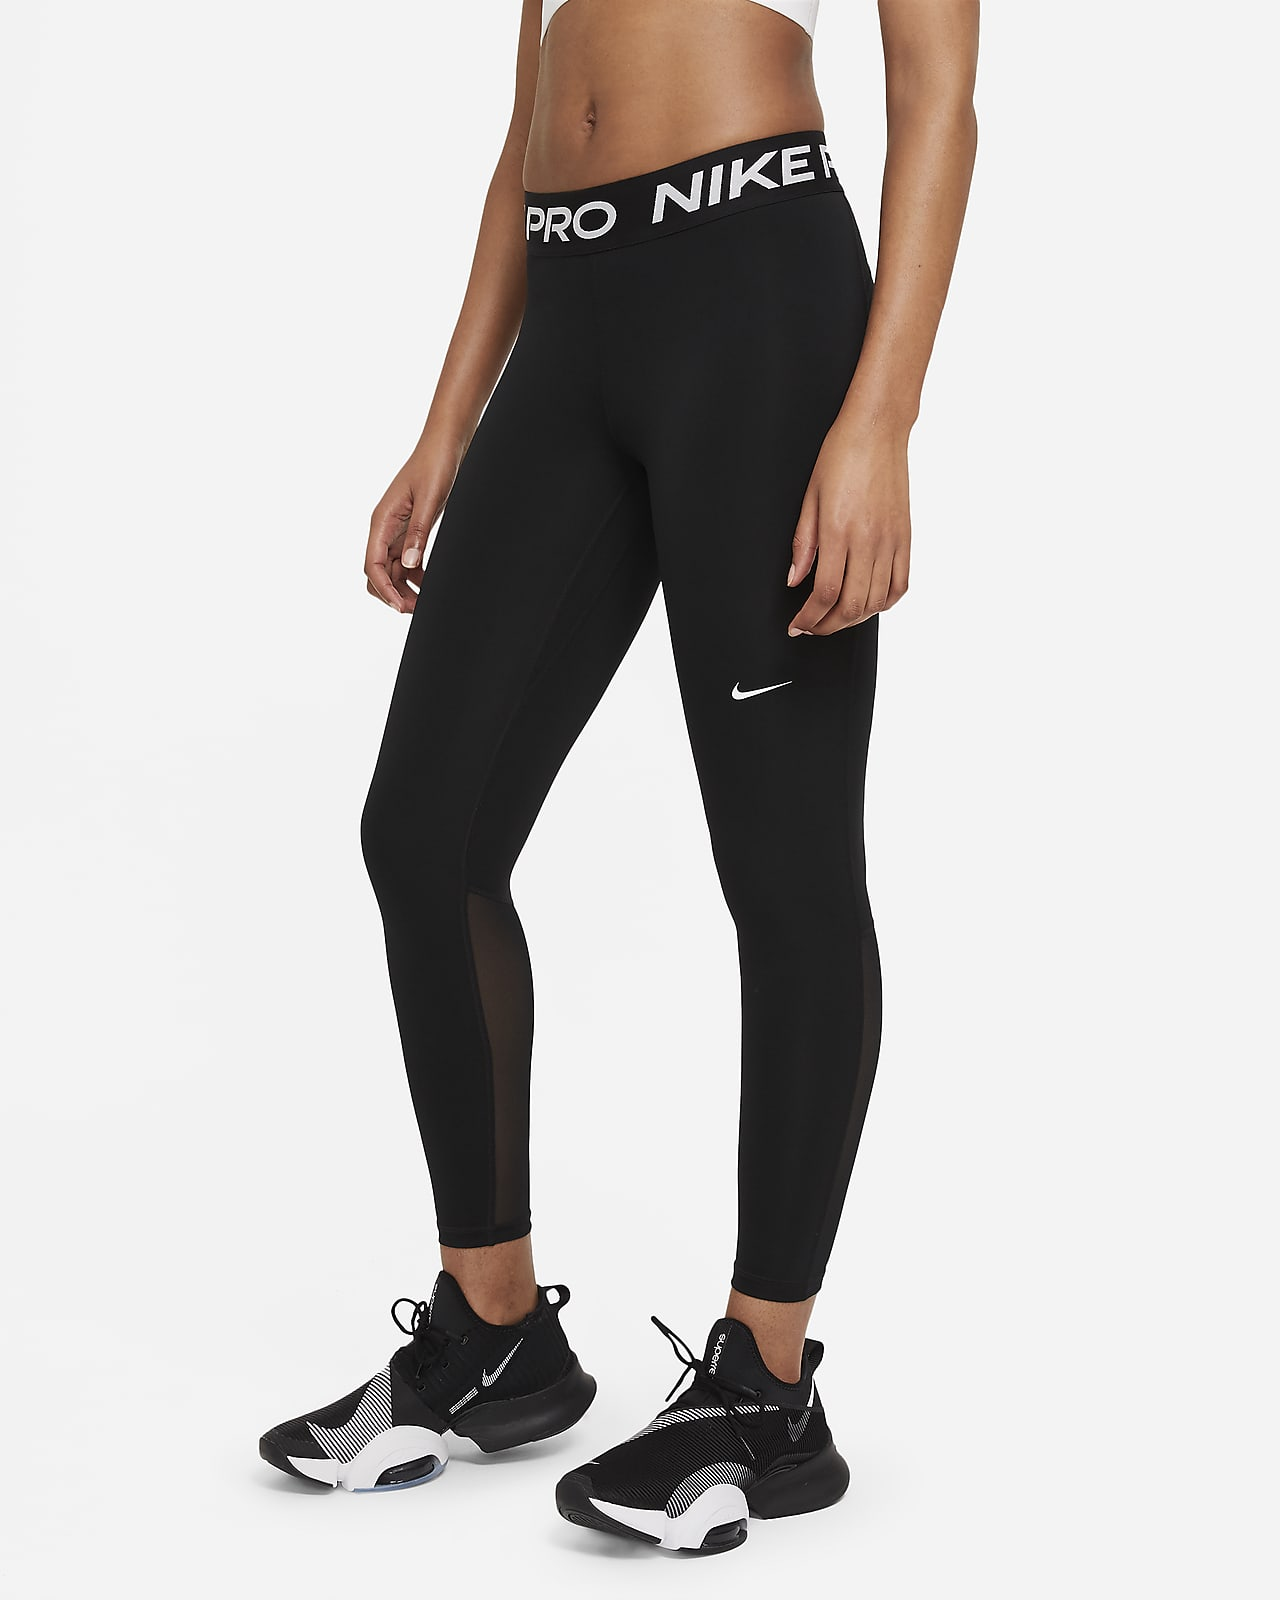 Nike Pro 女子中腰训练紧身裤